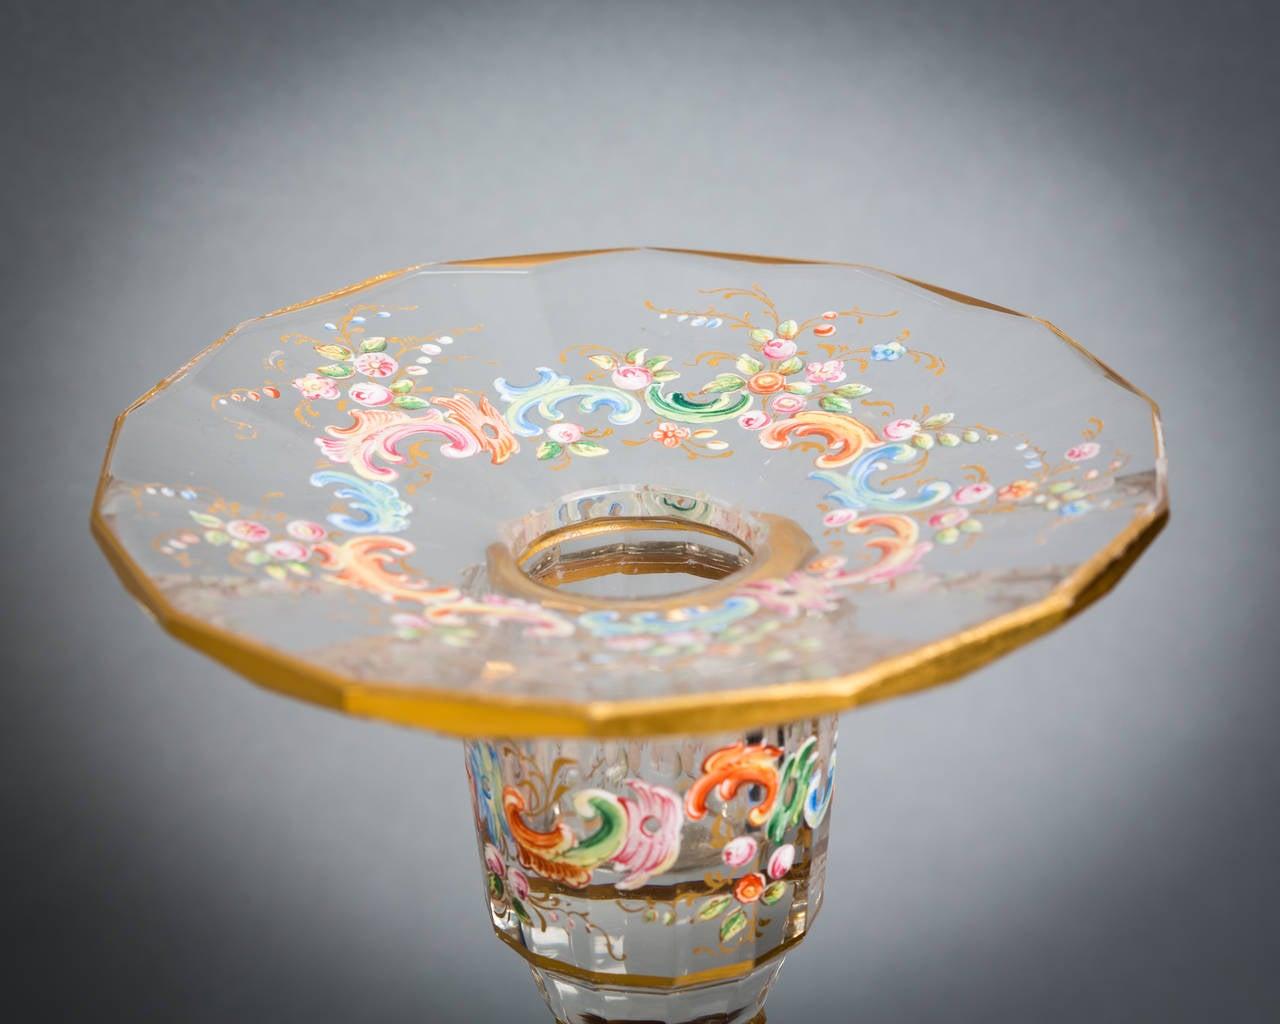 Austrian Enamel Table Glassware, Lobmeyr, circa 1890 For Sale 5